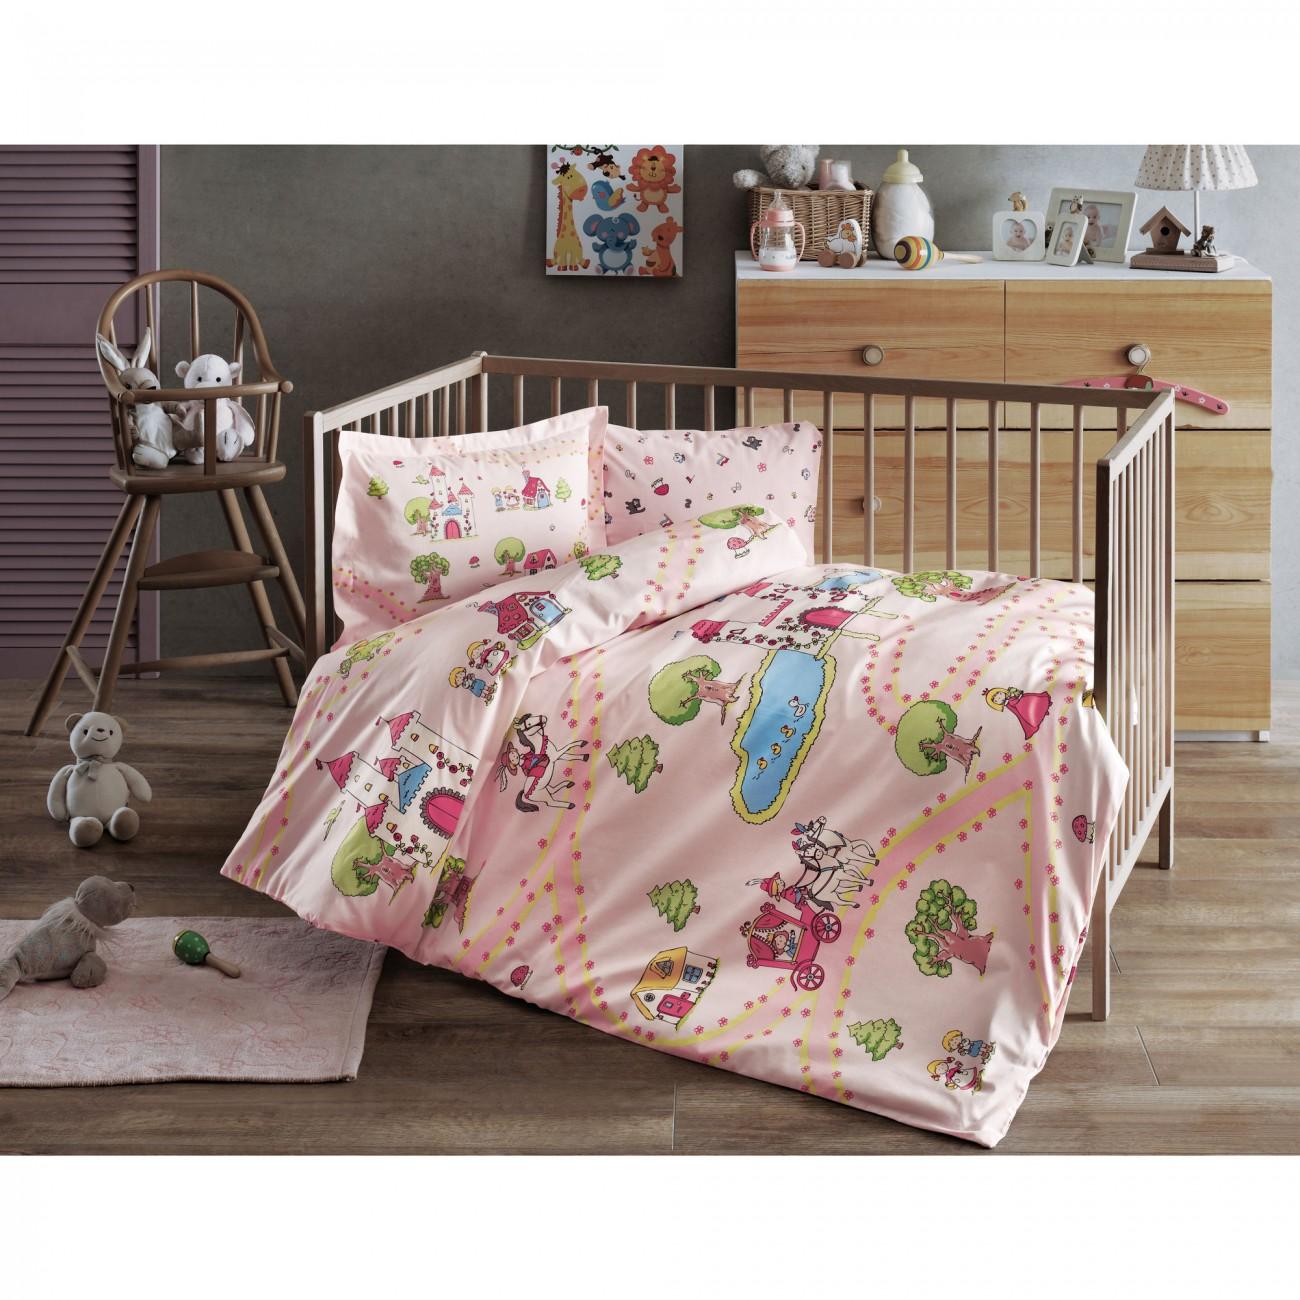 Tac Rancforce Baby Bettwäsche Set Prinzessin Pink